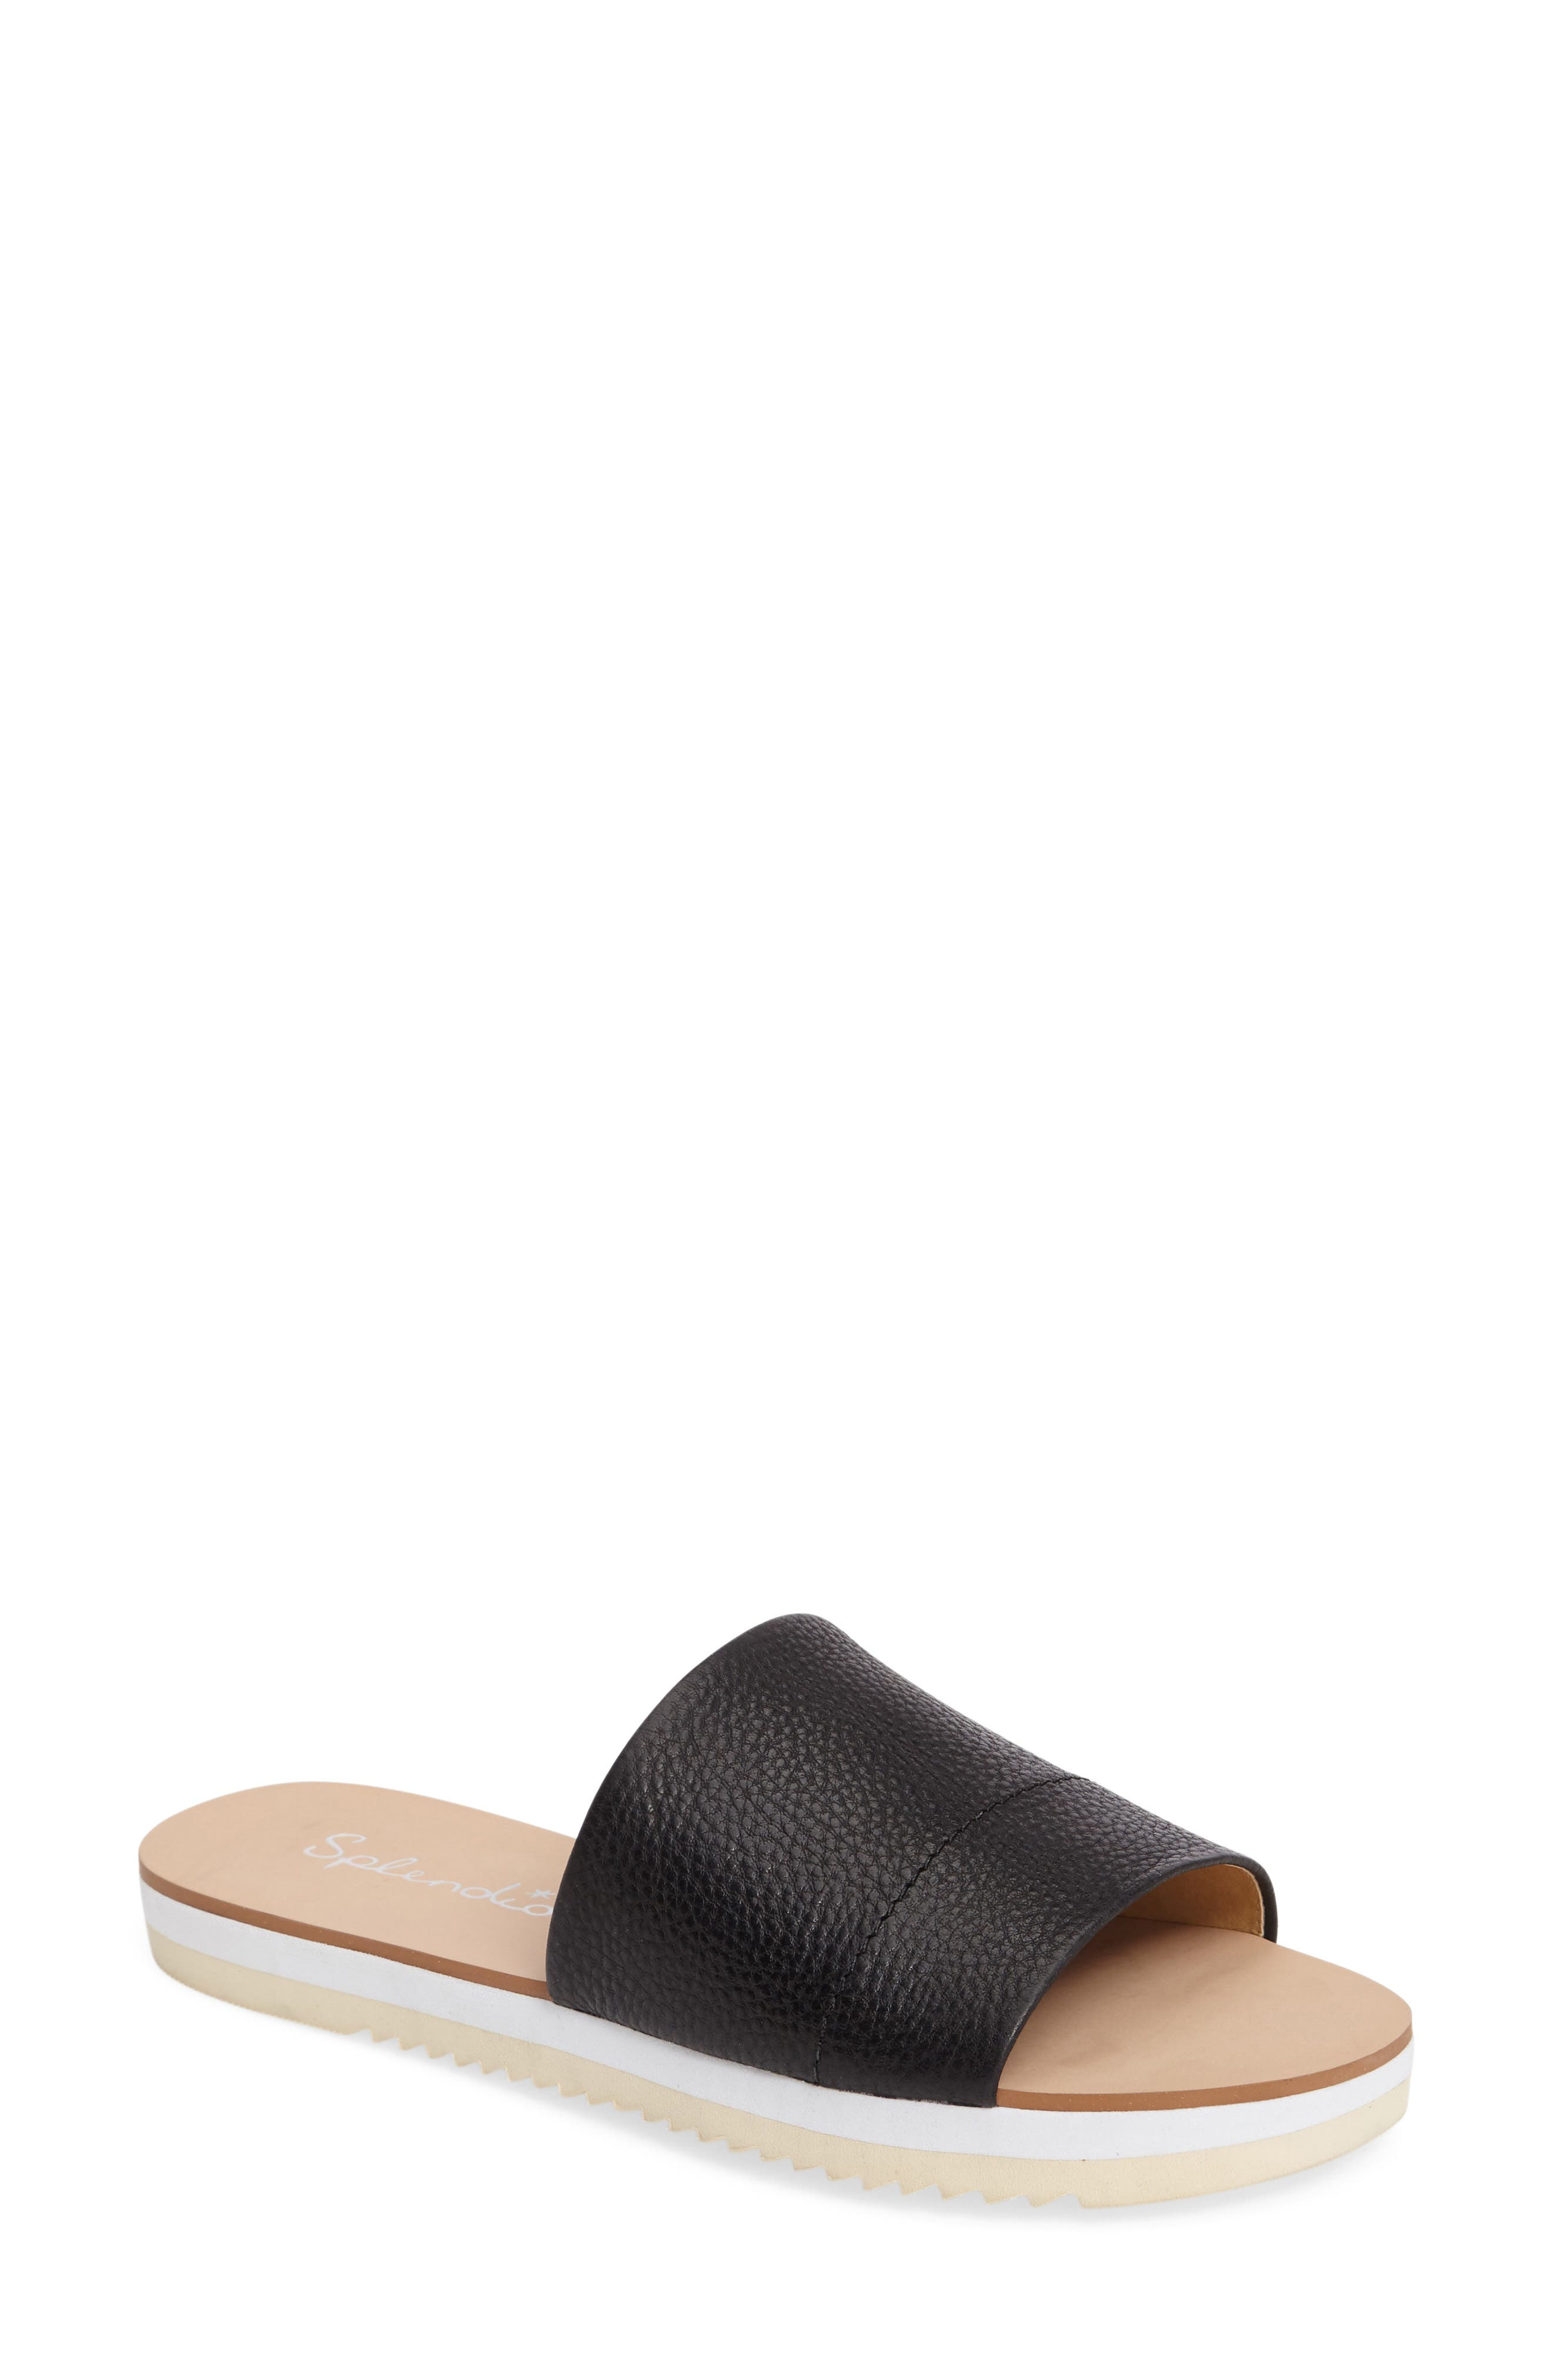 Jazz Slide Sandal,                             Main thumbnail 1, color,                             Black Leather